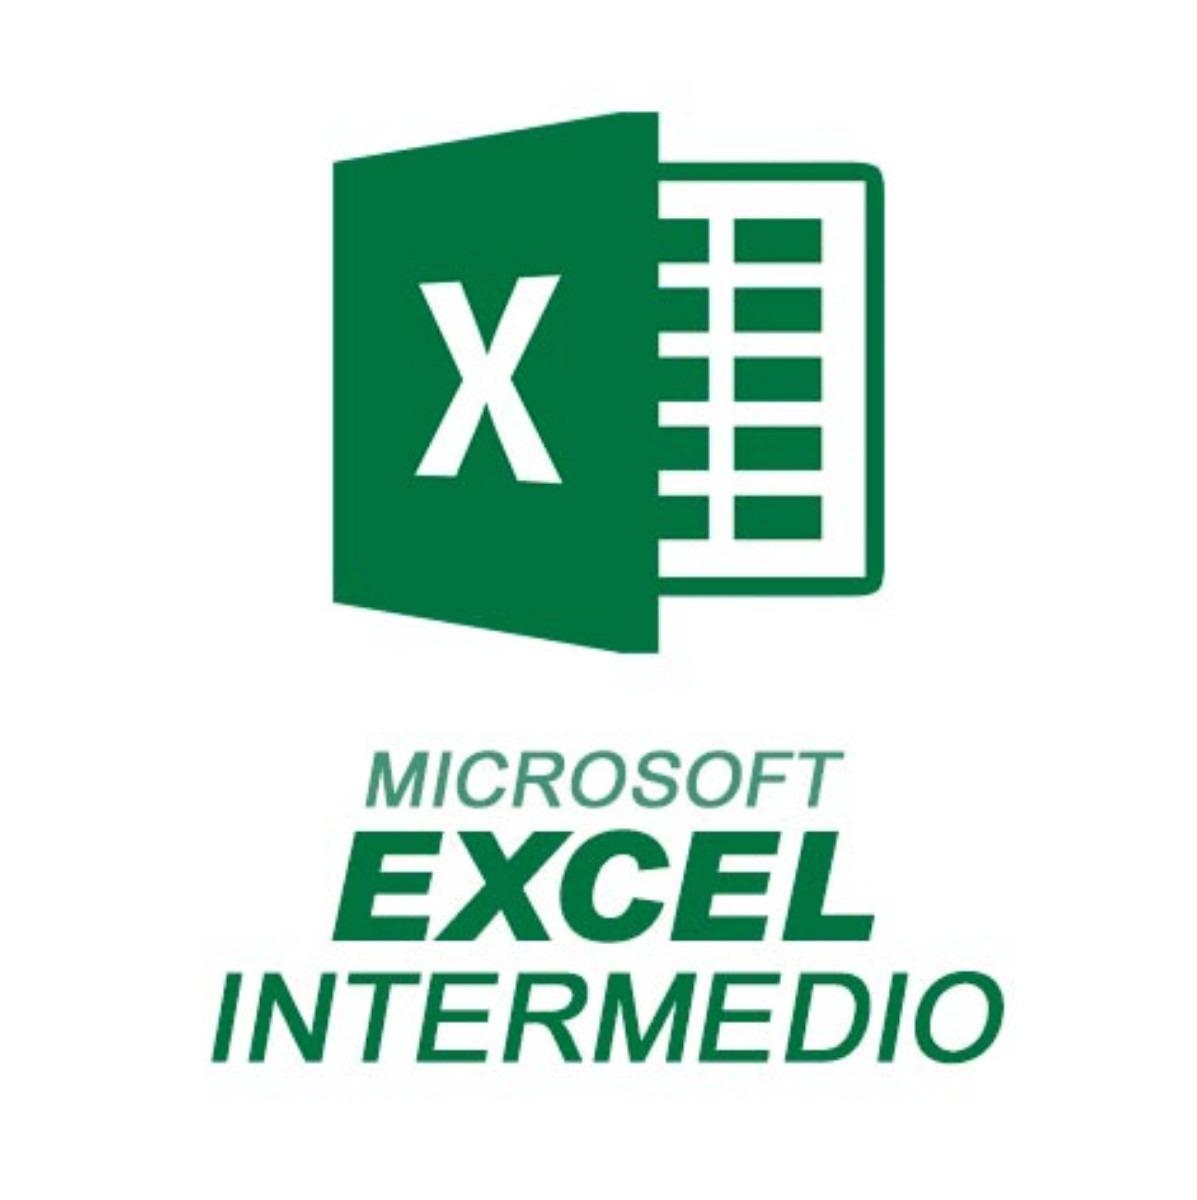 Microsoft Excel Intermedio